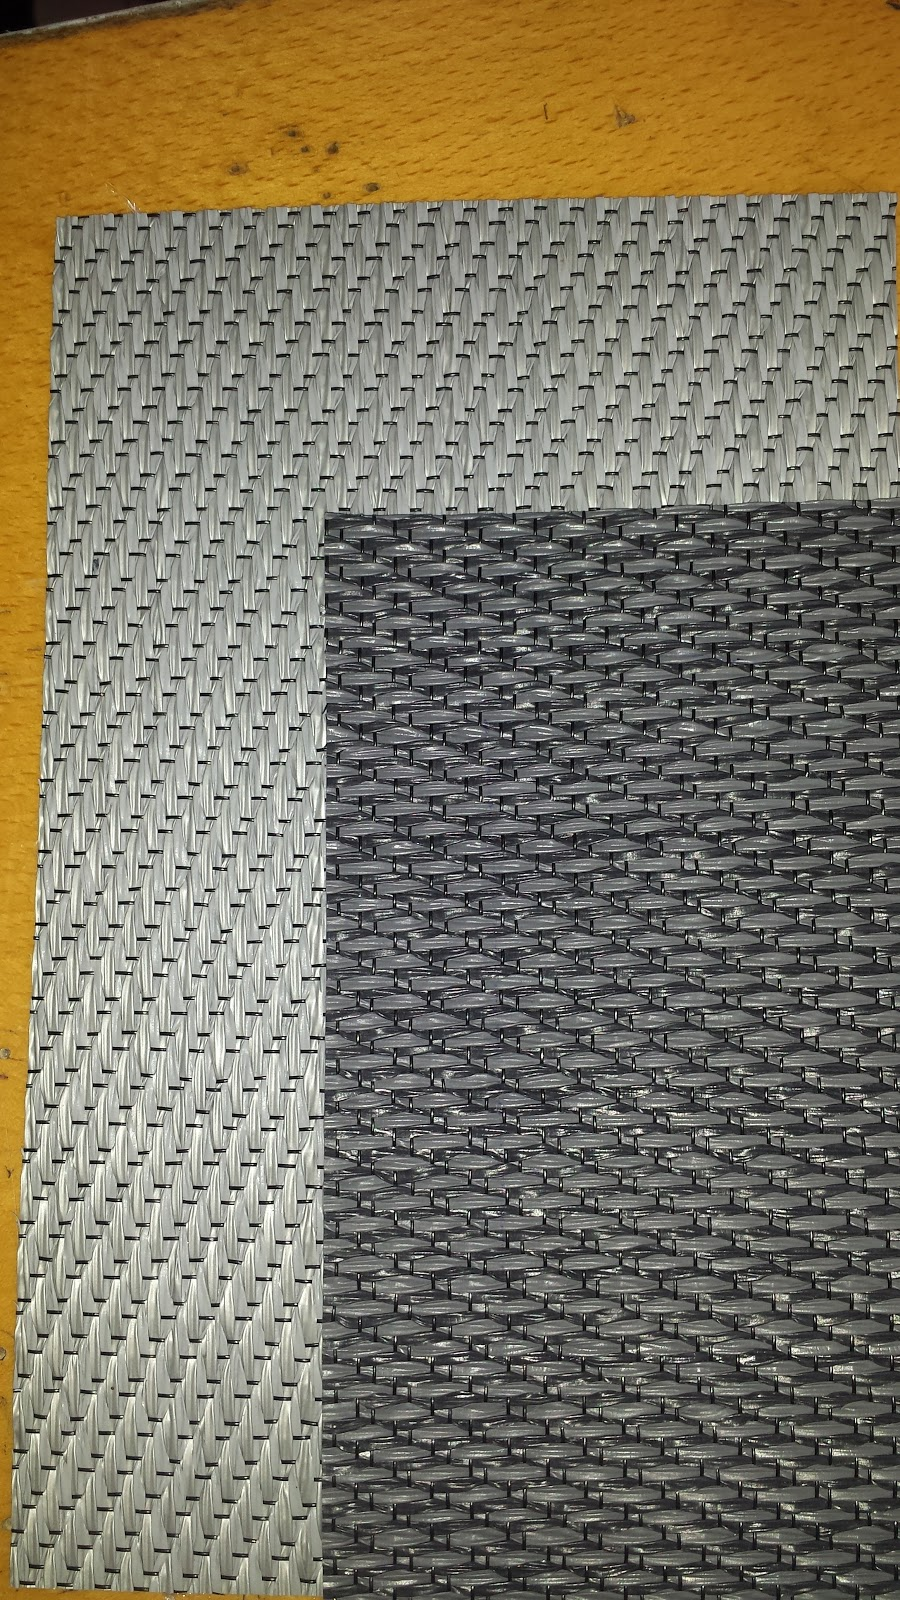 Deco hogar galdakao alfombras de vinilo fregables - Alfombras pvc leroy merlin ...